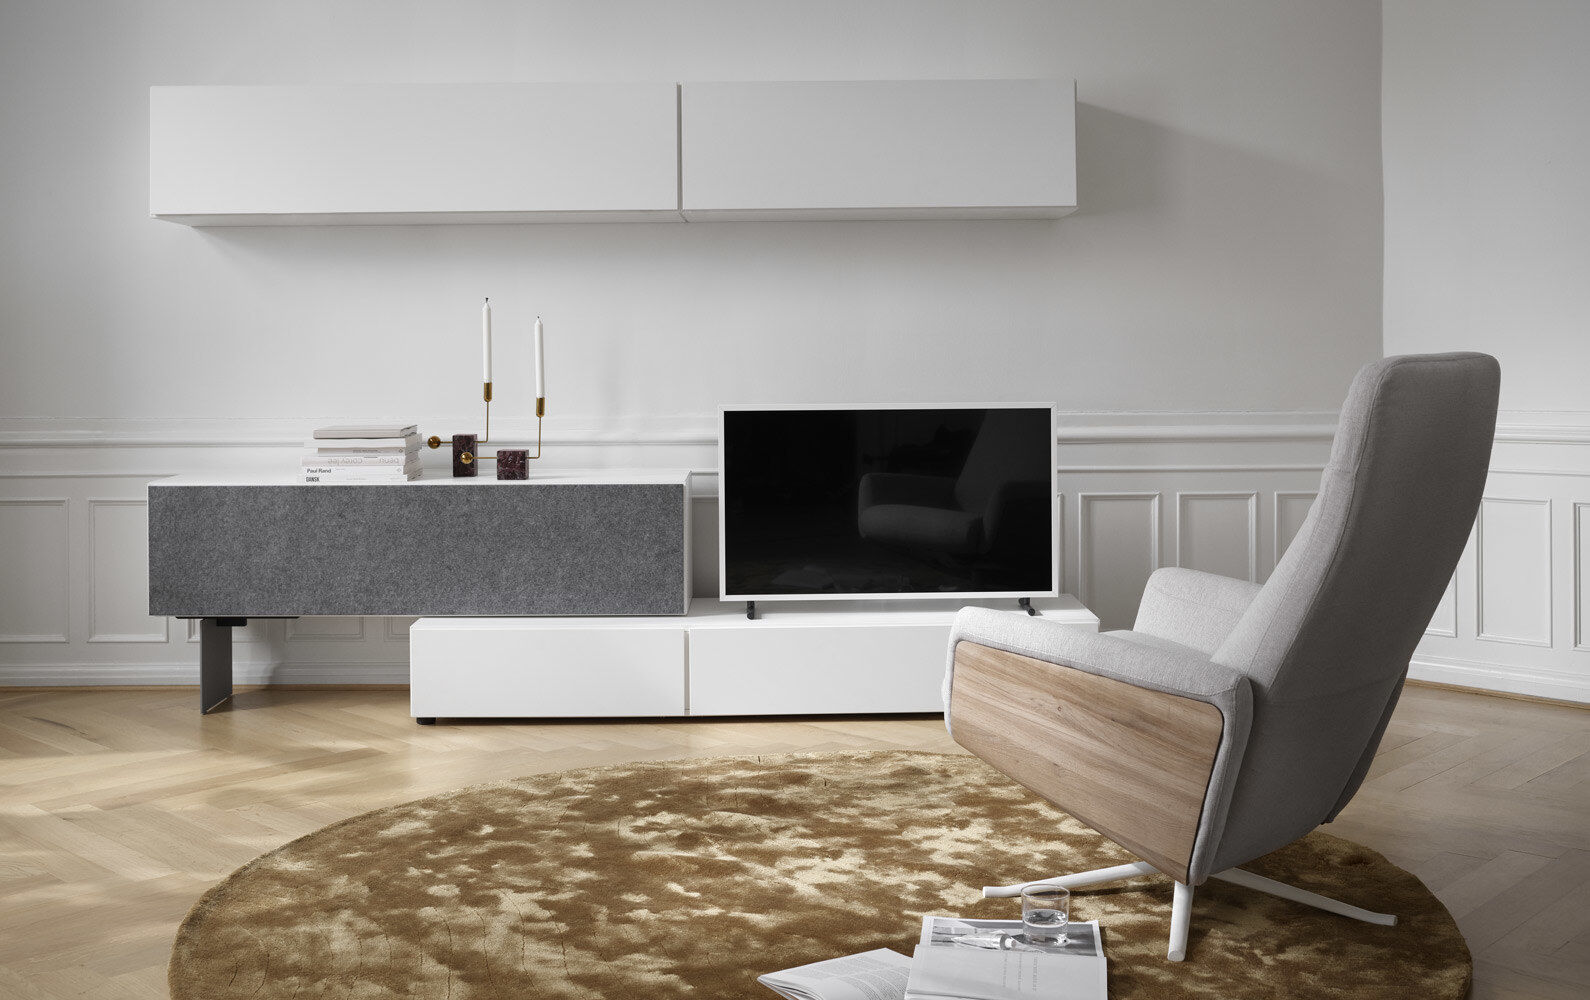 meuble lugano avec fixation murale et porte abattante